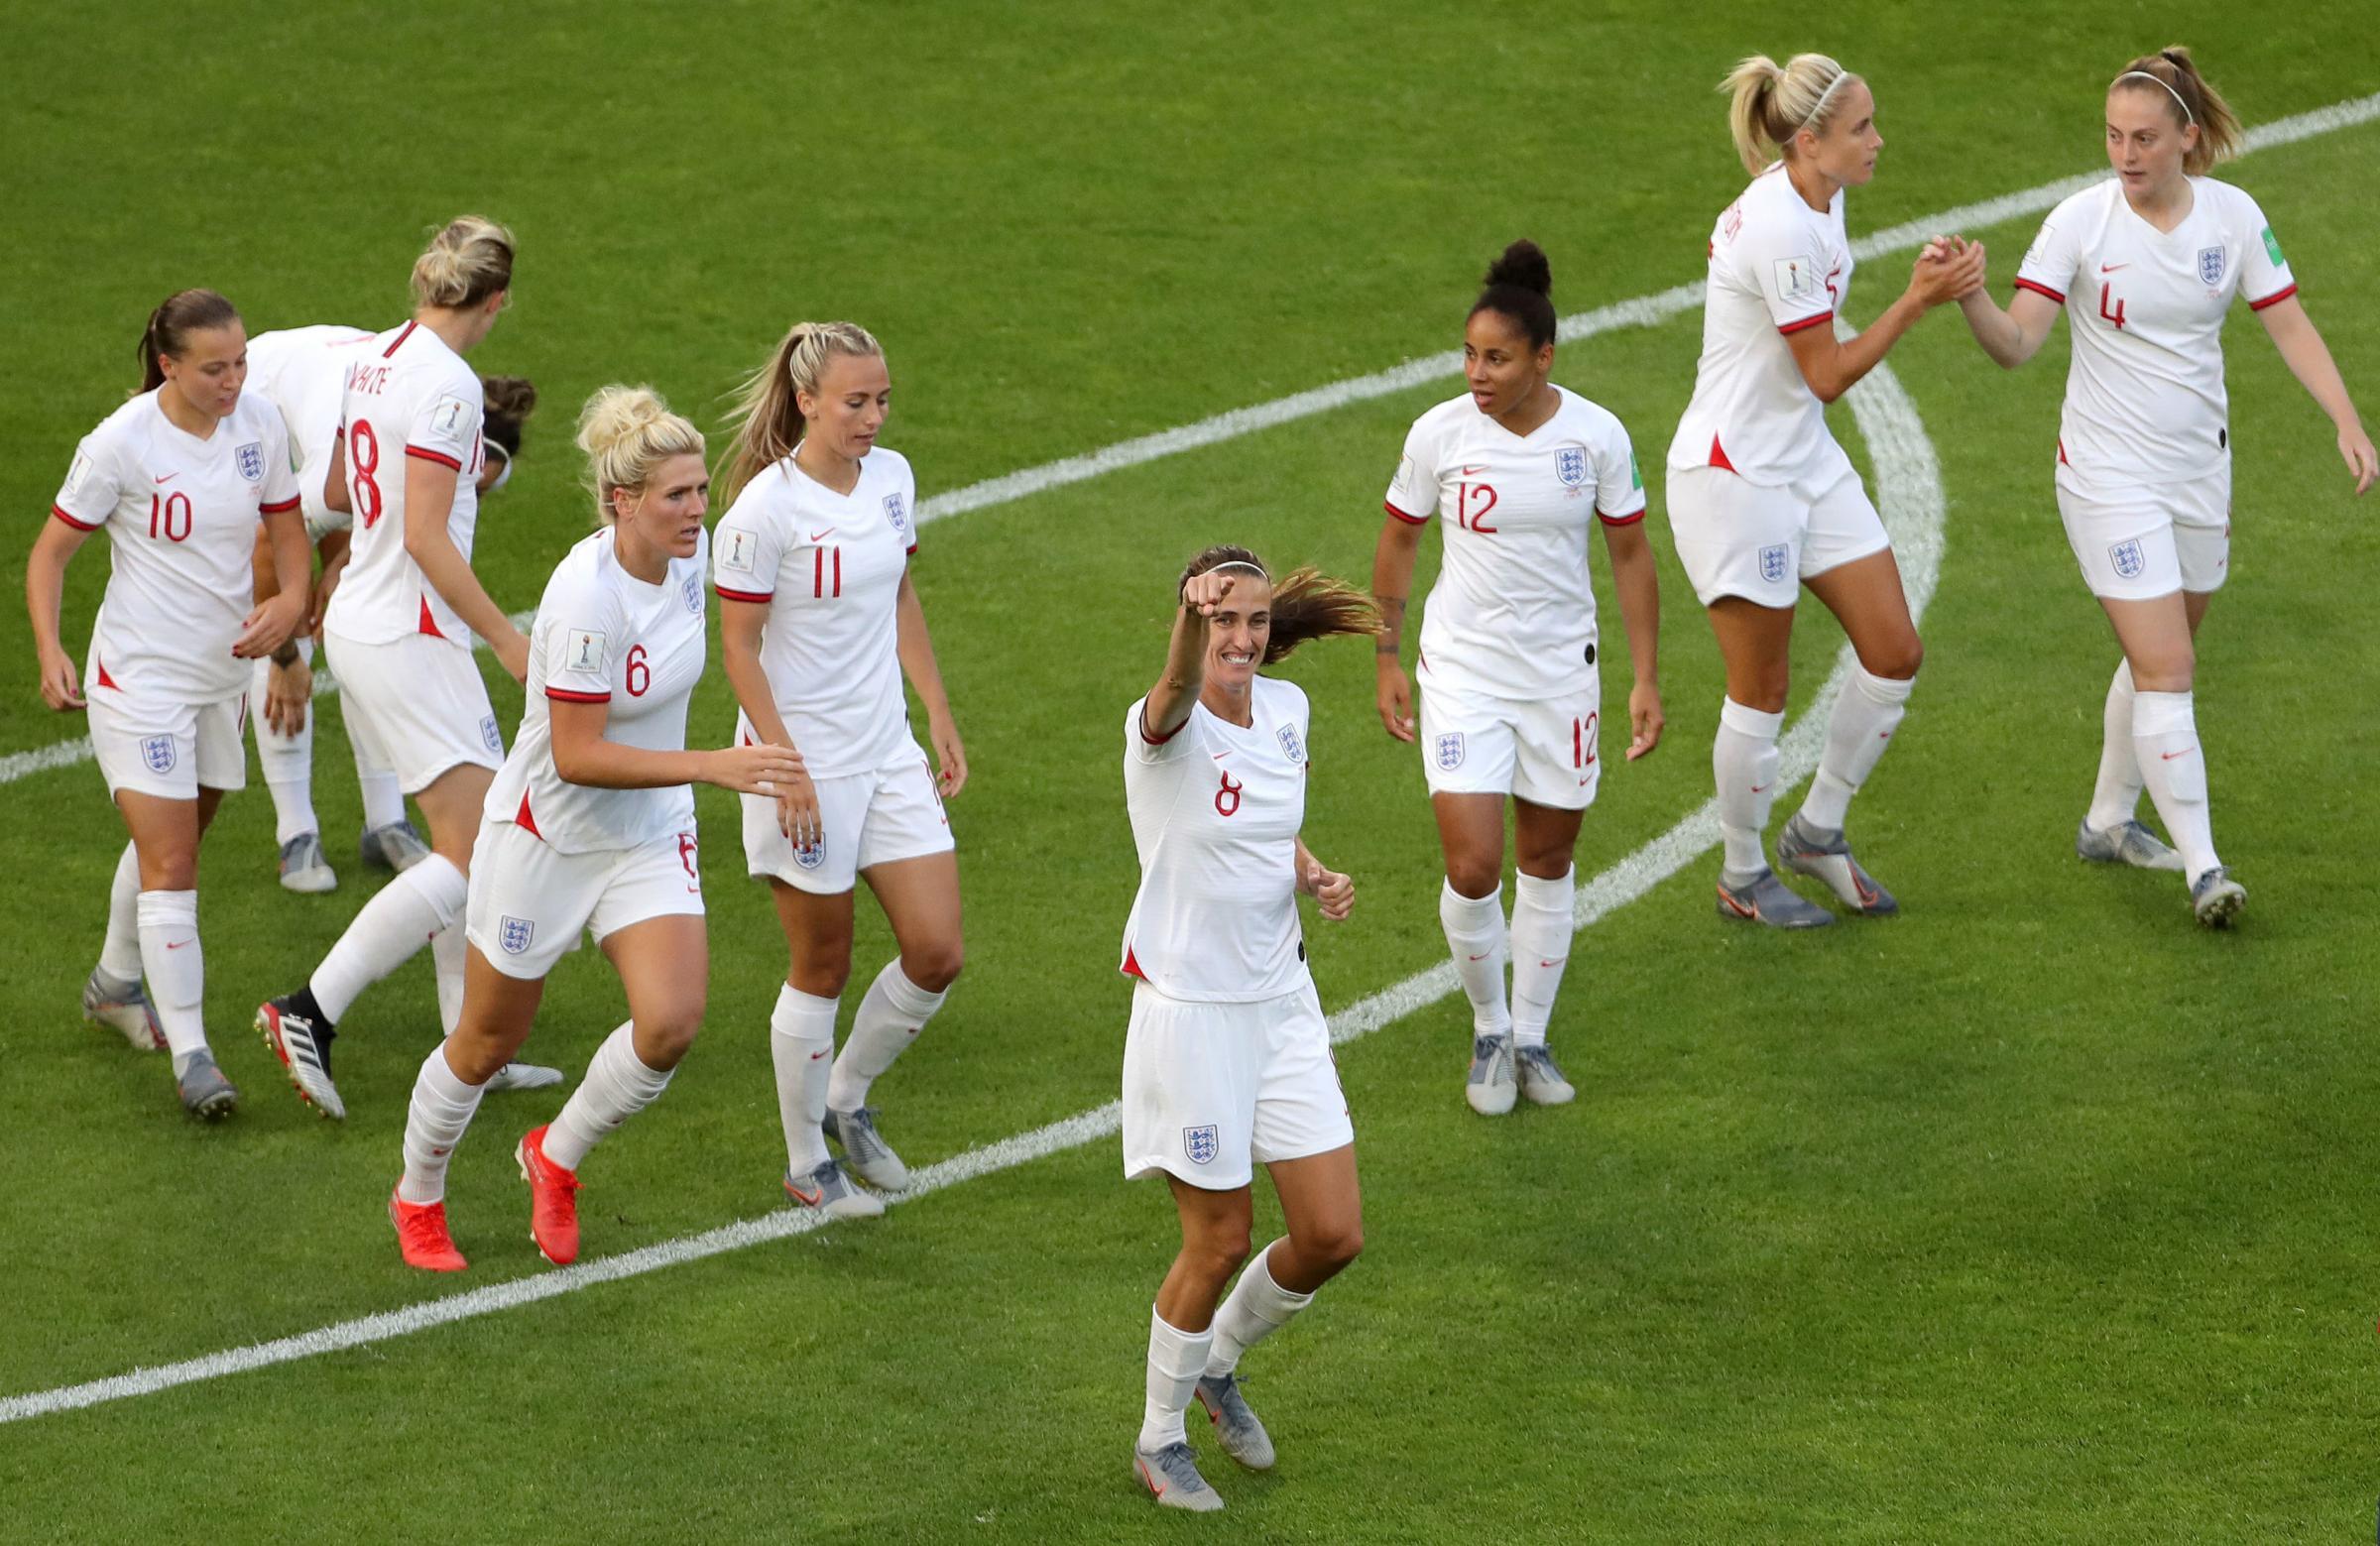 WIN family tickets for England Women vs Brazil Women